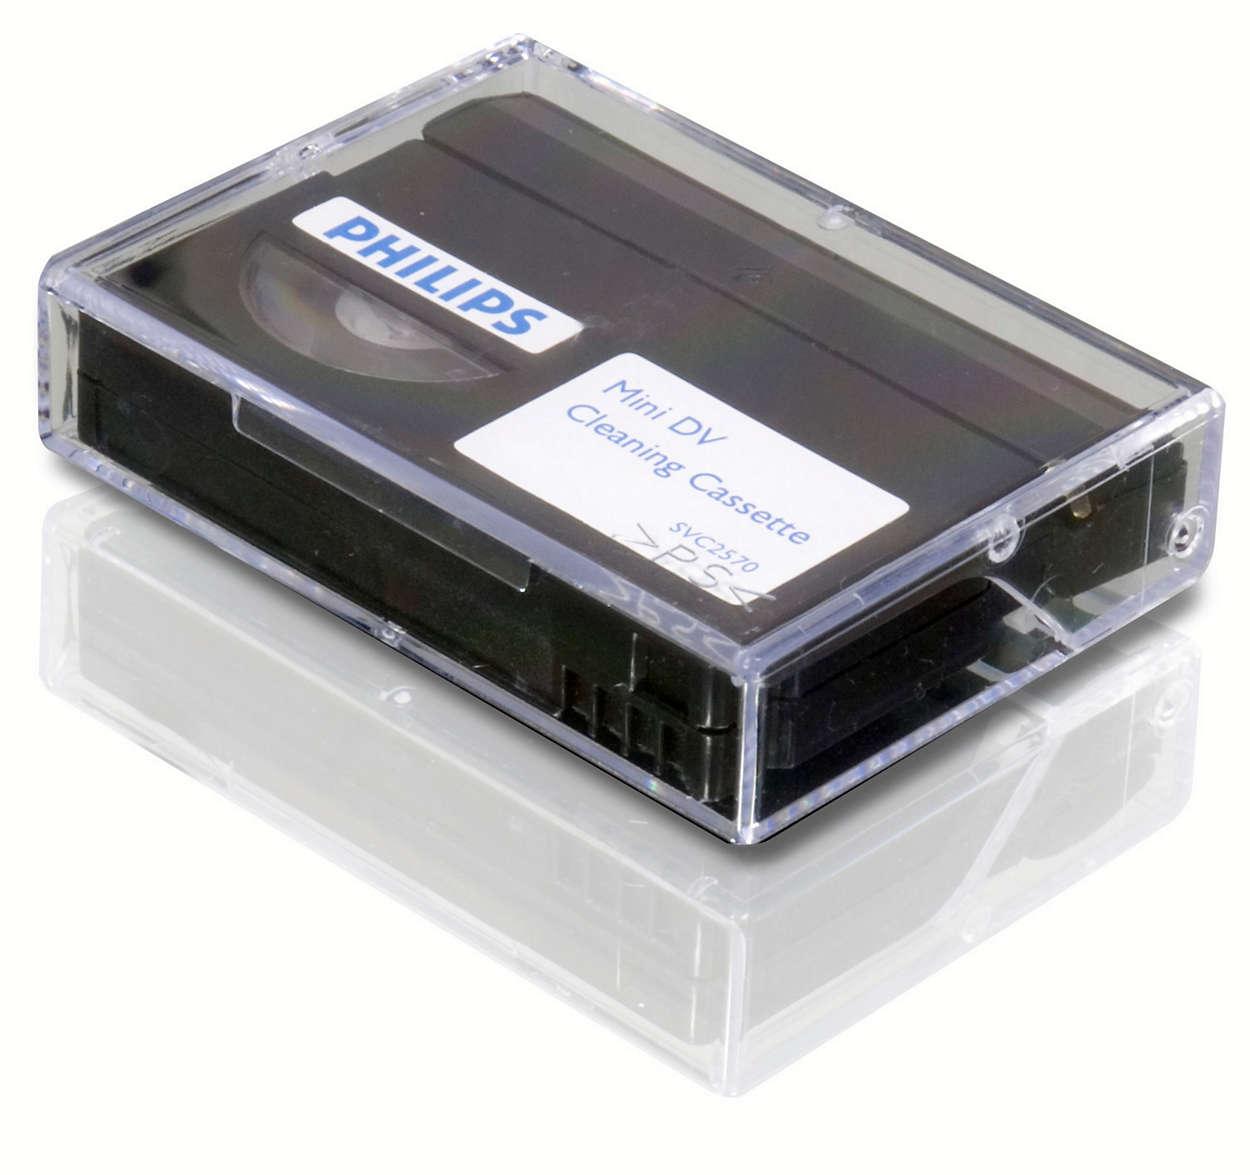 Reinigung Ihres Mini-DV-Camcorders